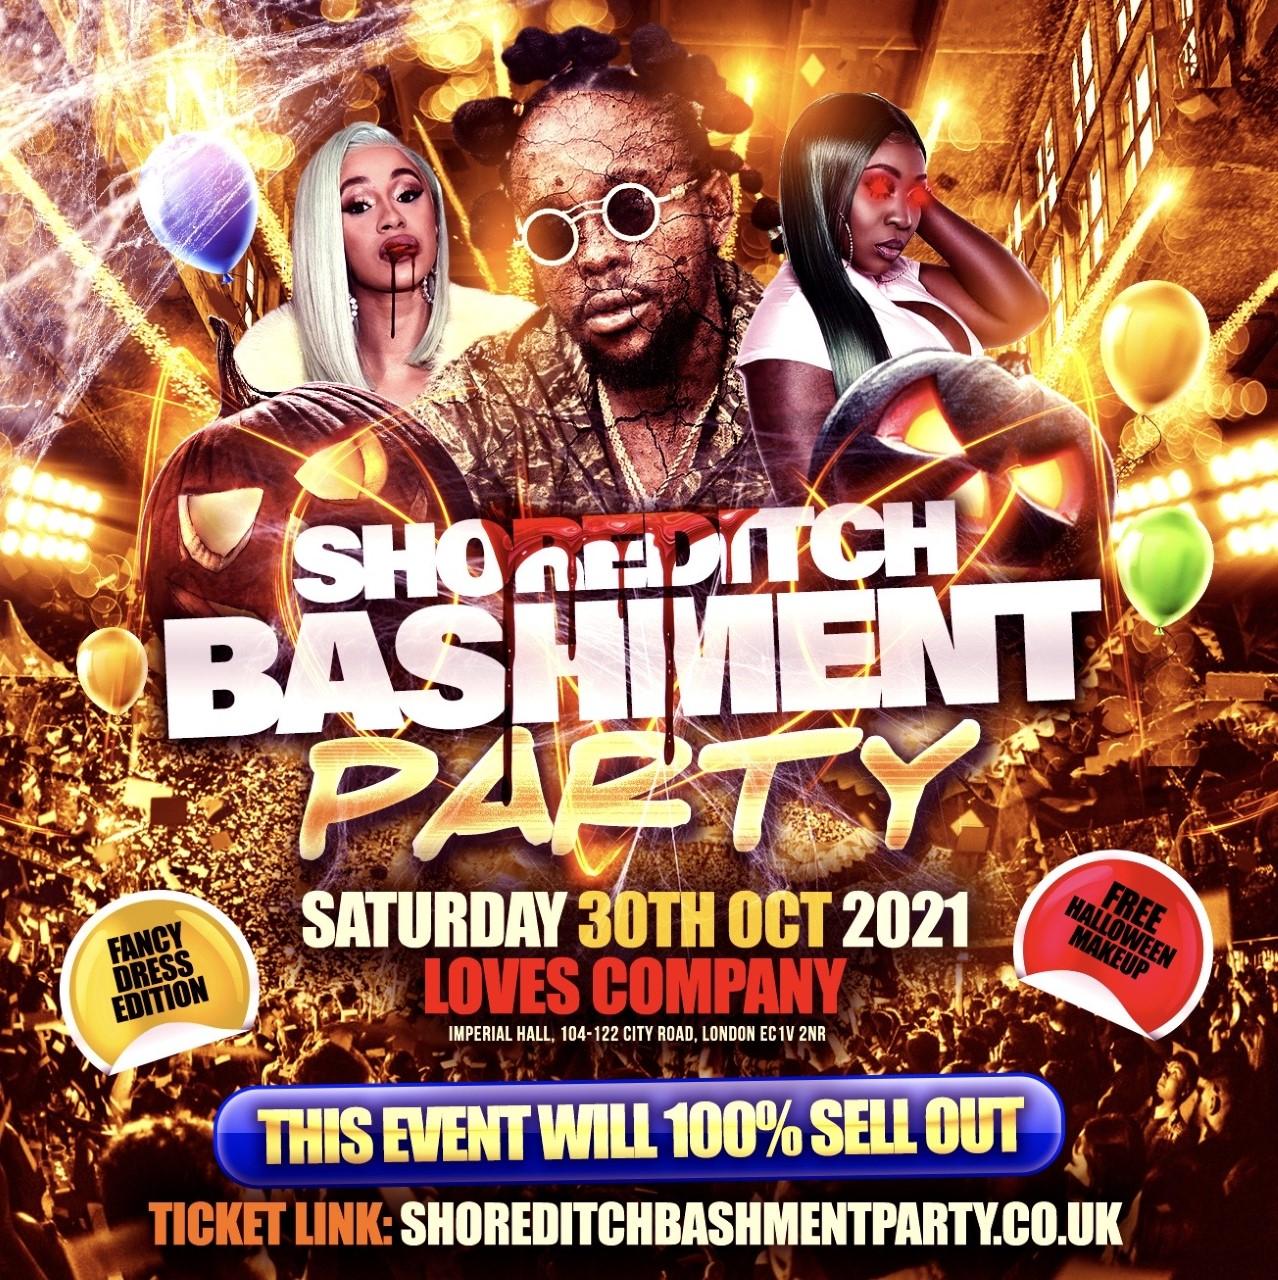 Shoreditch Bashment Party - Halloween Carnival